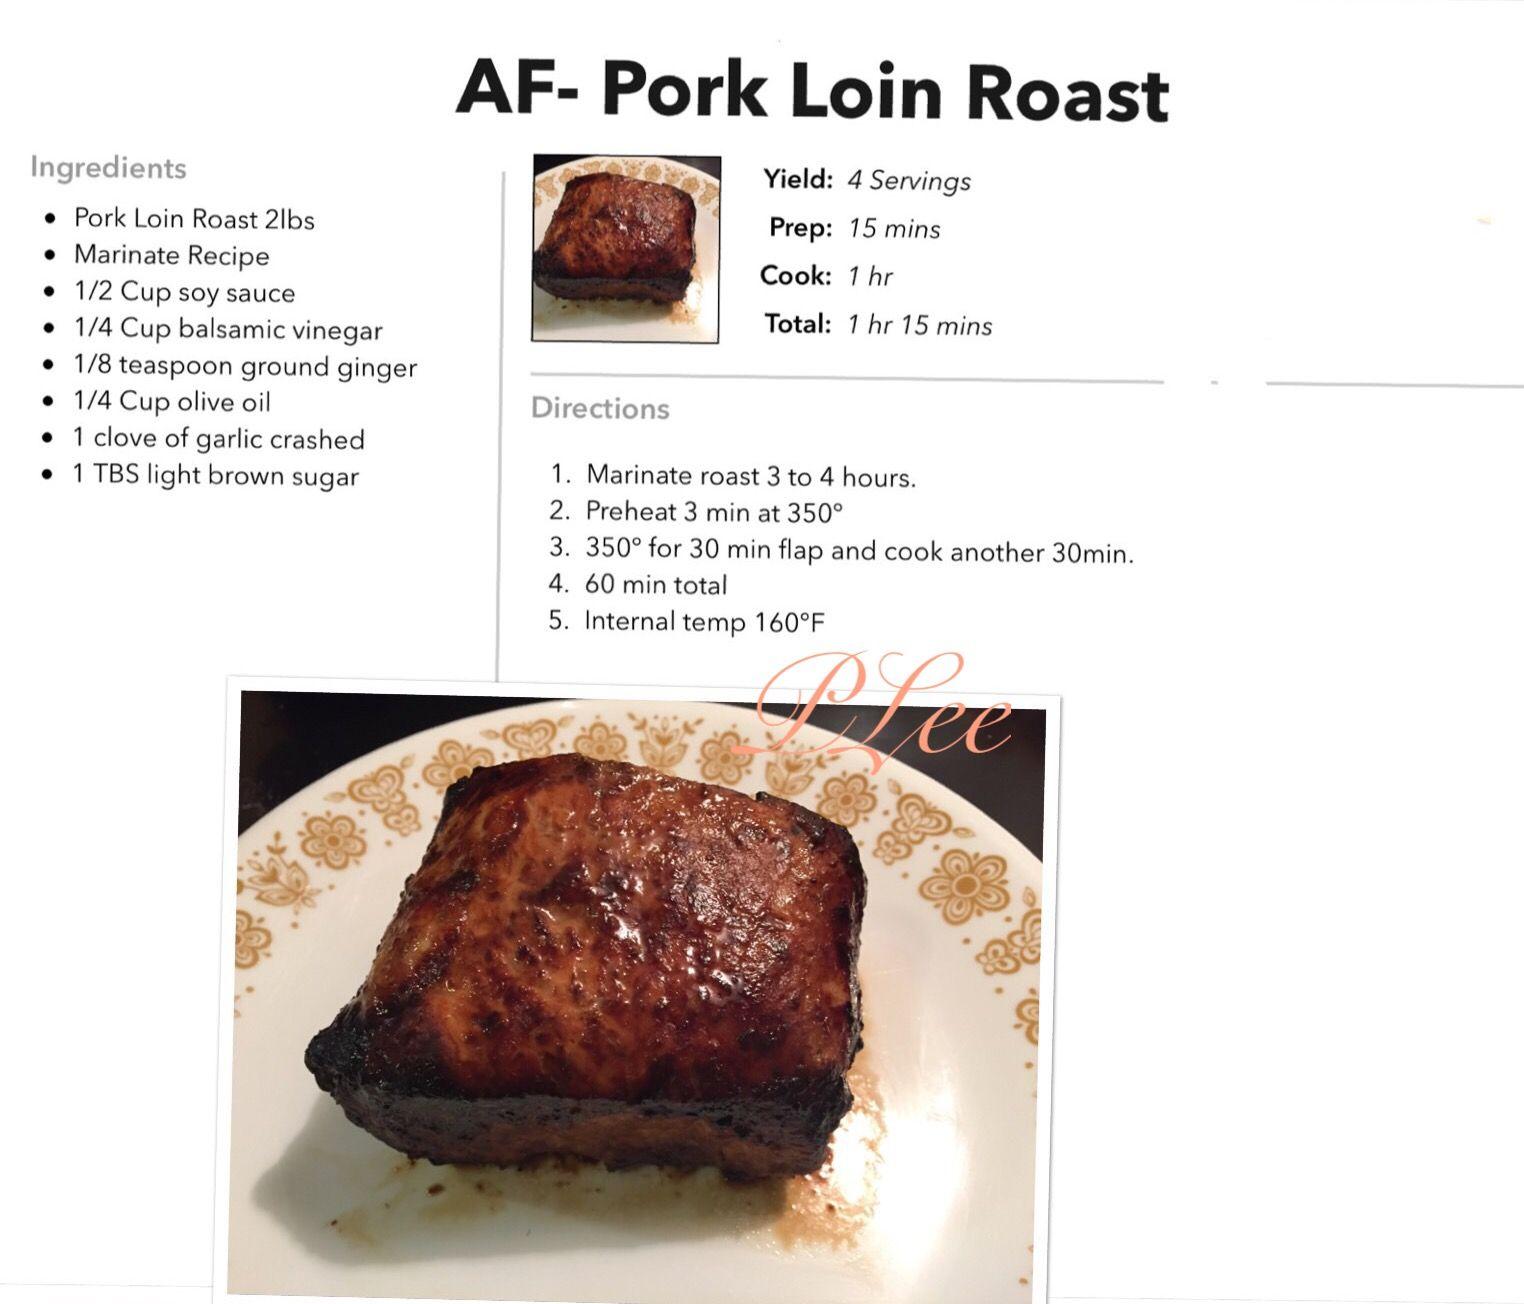 Air Fryer Marinated Pork Loin Roast Air fryer recipes